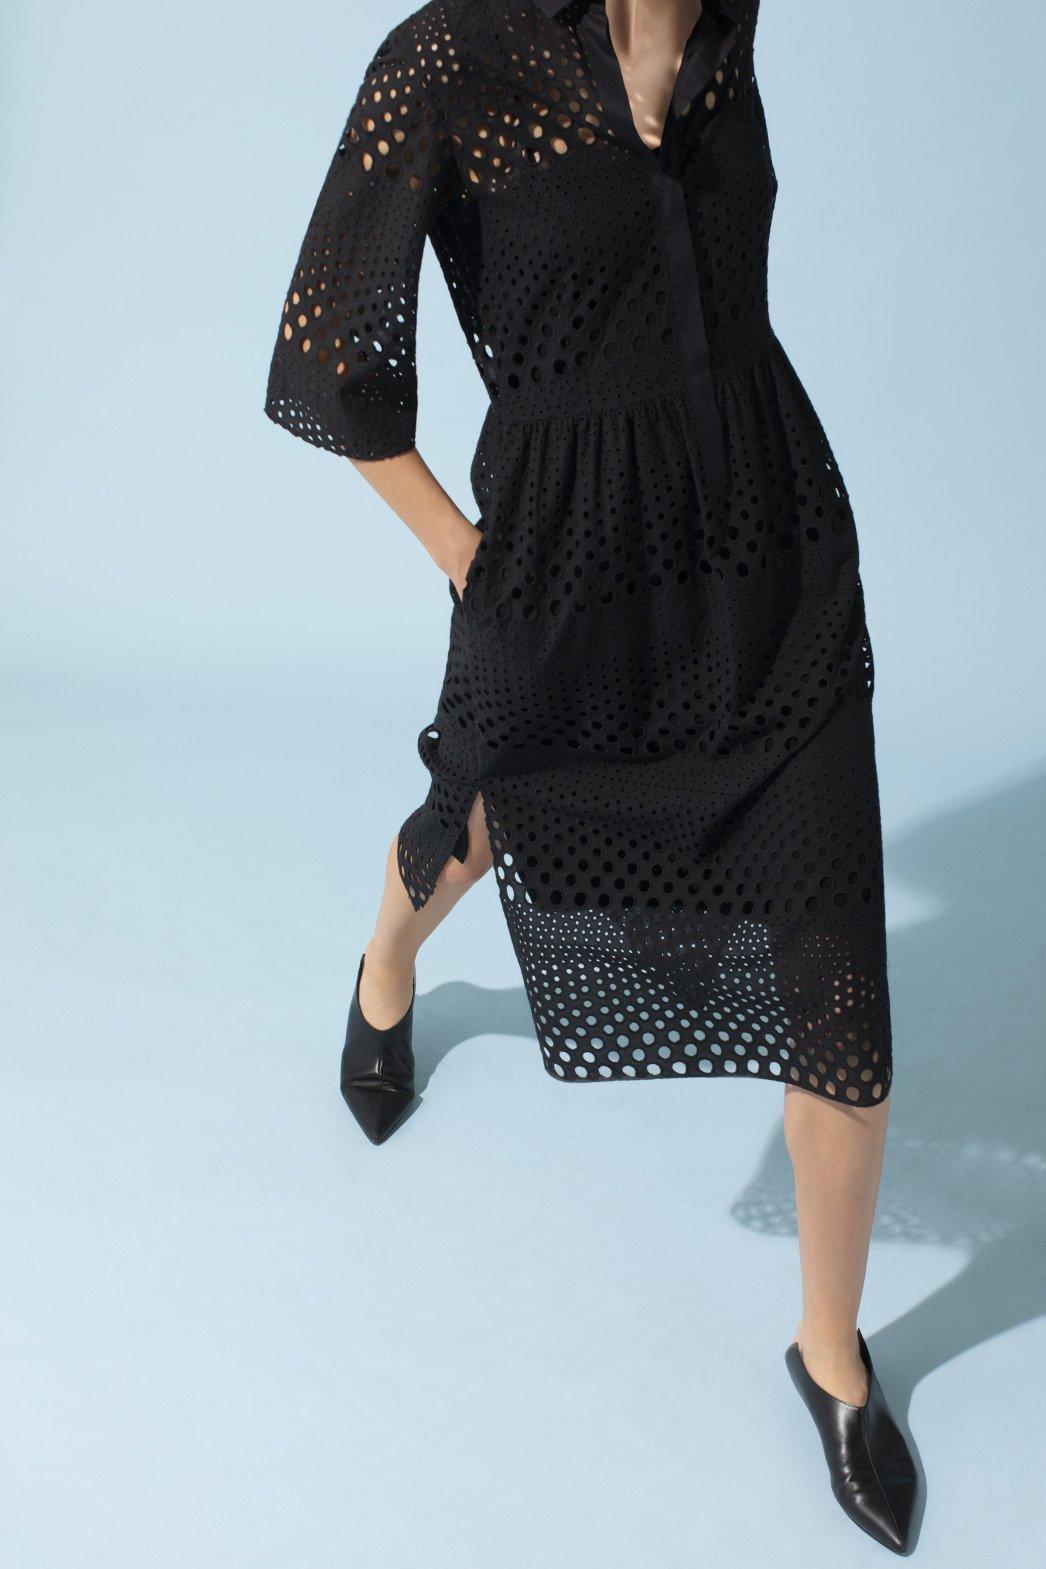 Women wearing a black designer dress with dots